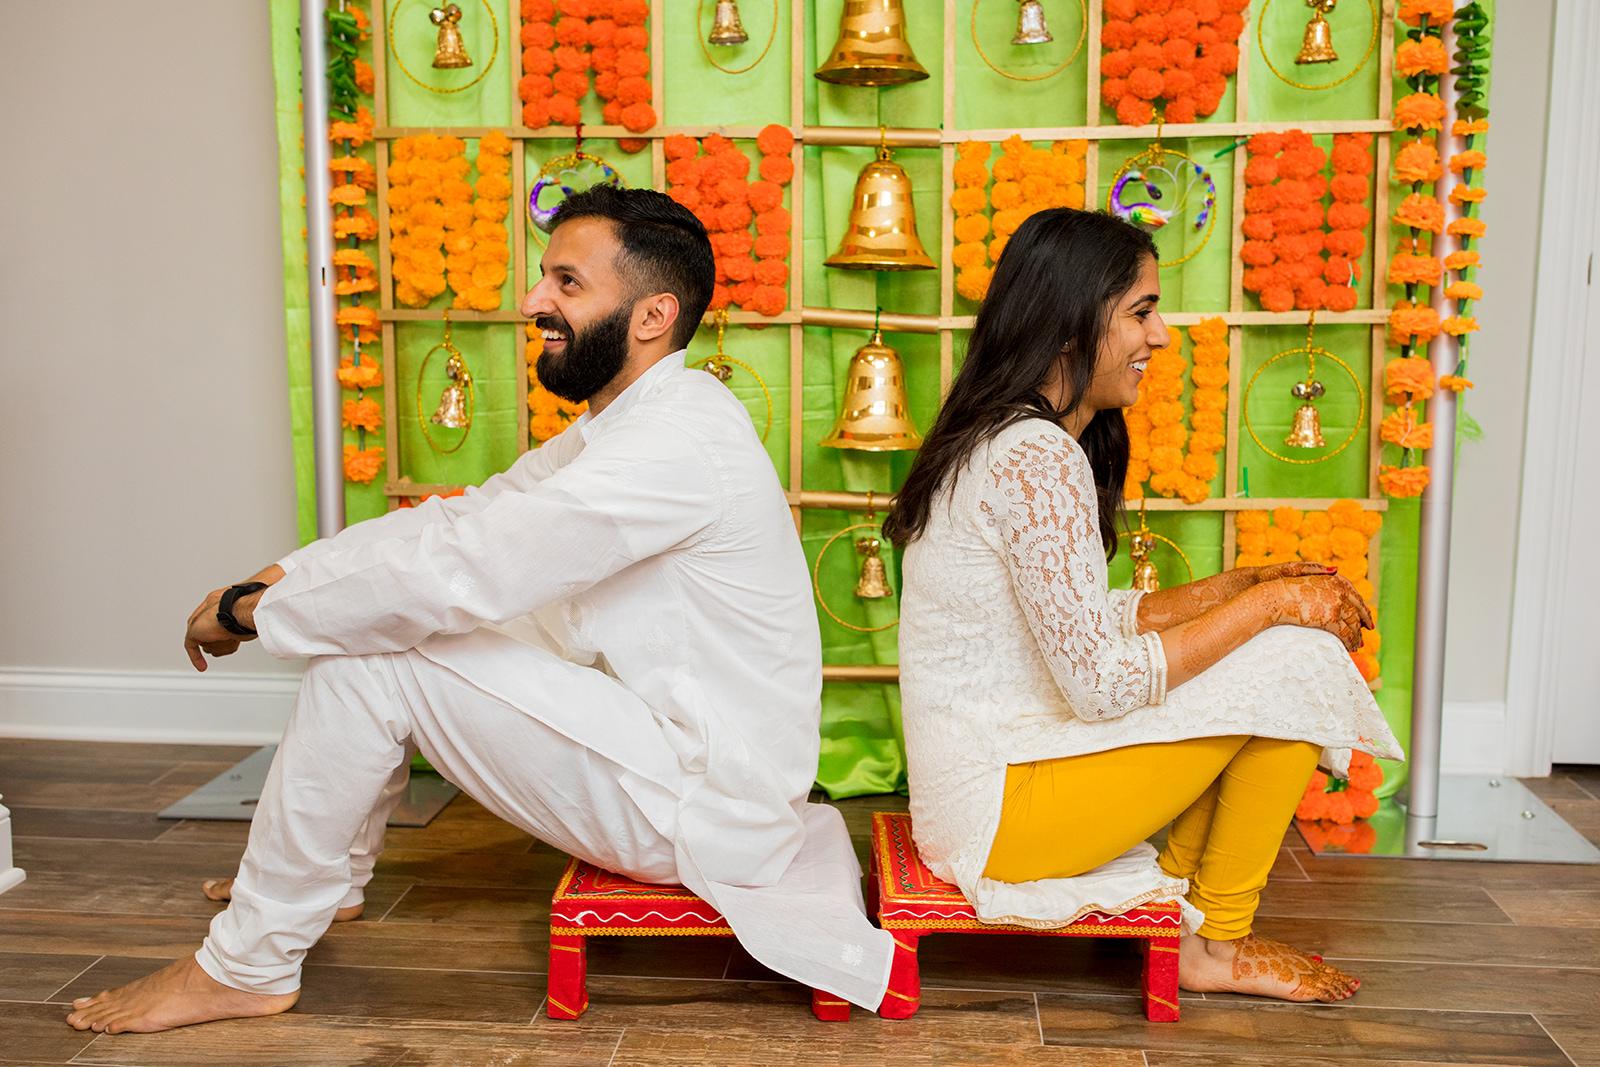 Le Cape Weddings - Sumeet and Chavi - Pithi-7.jpg